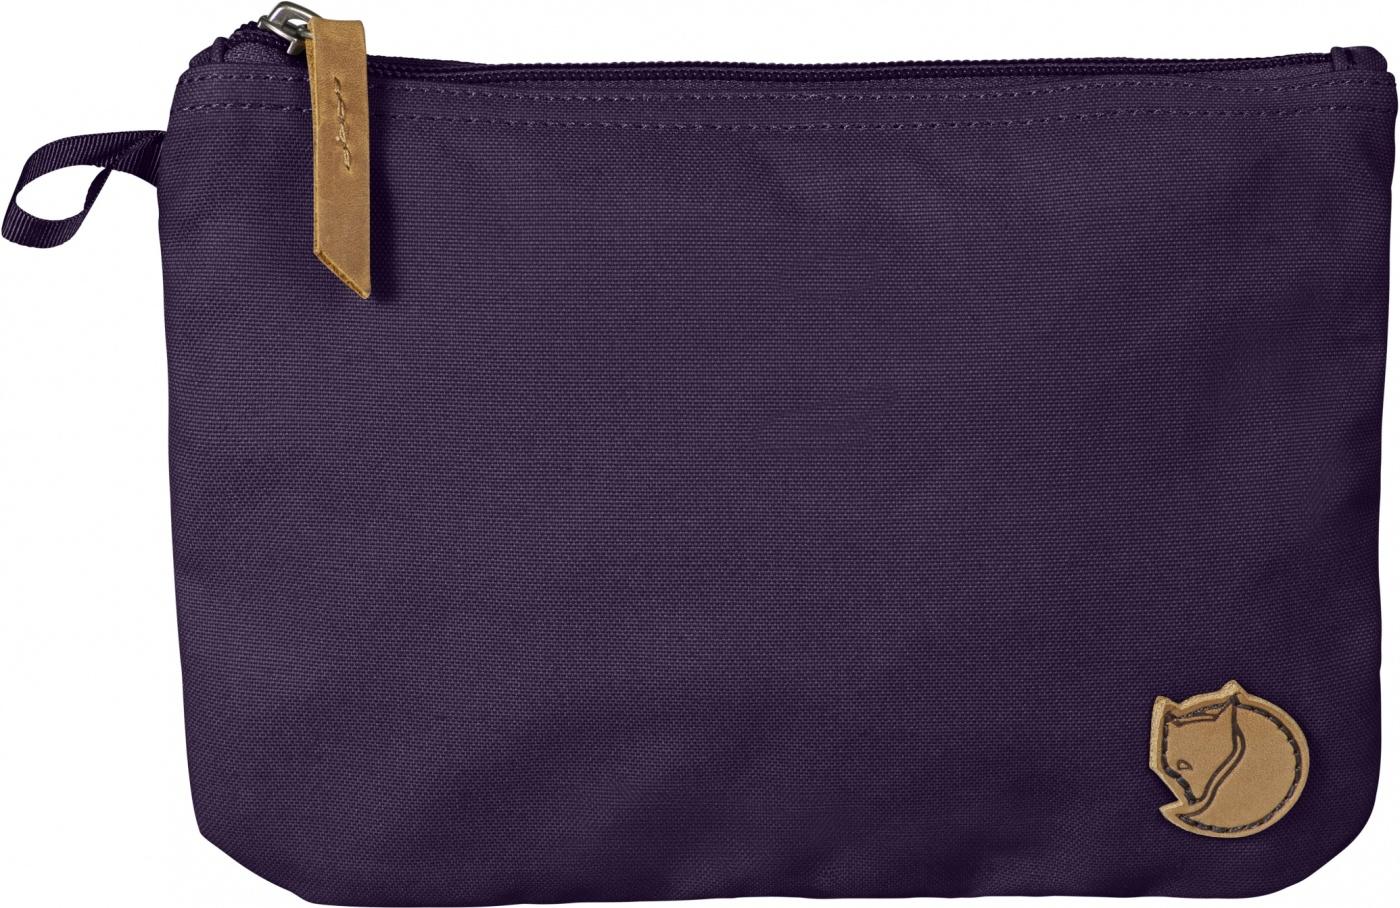 FjallRaven Gear Pocket Alpine Purple-30